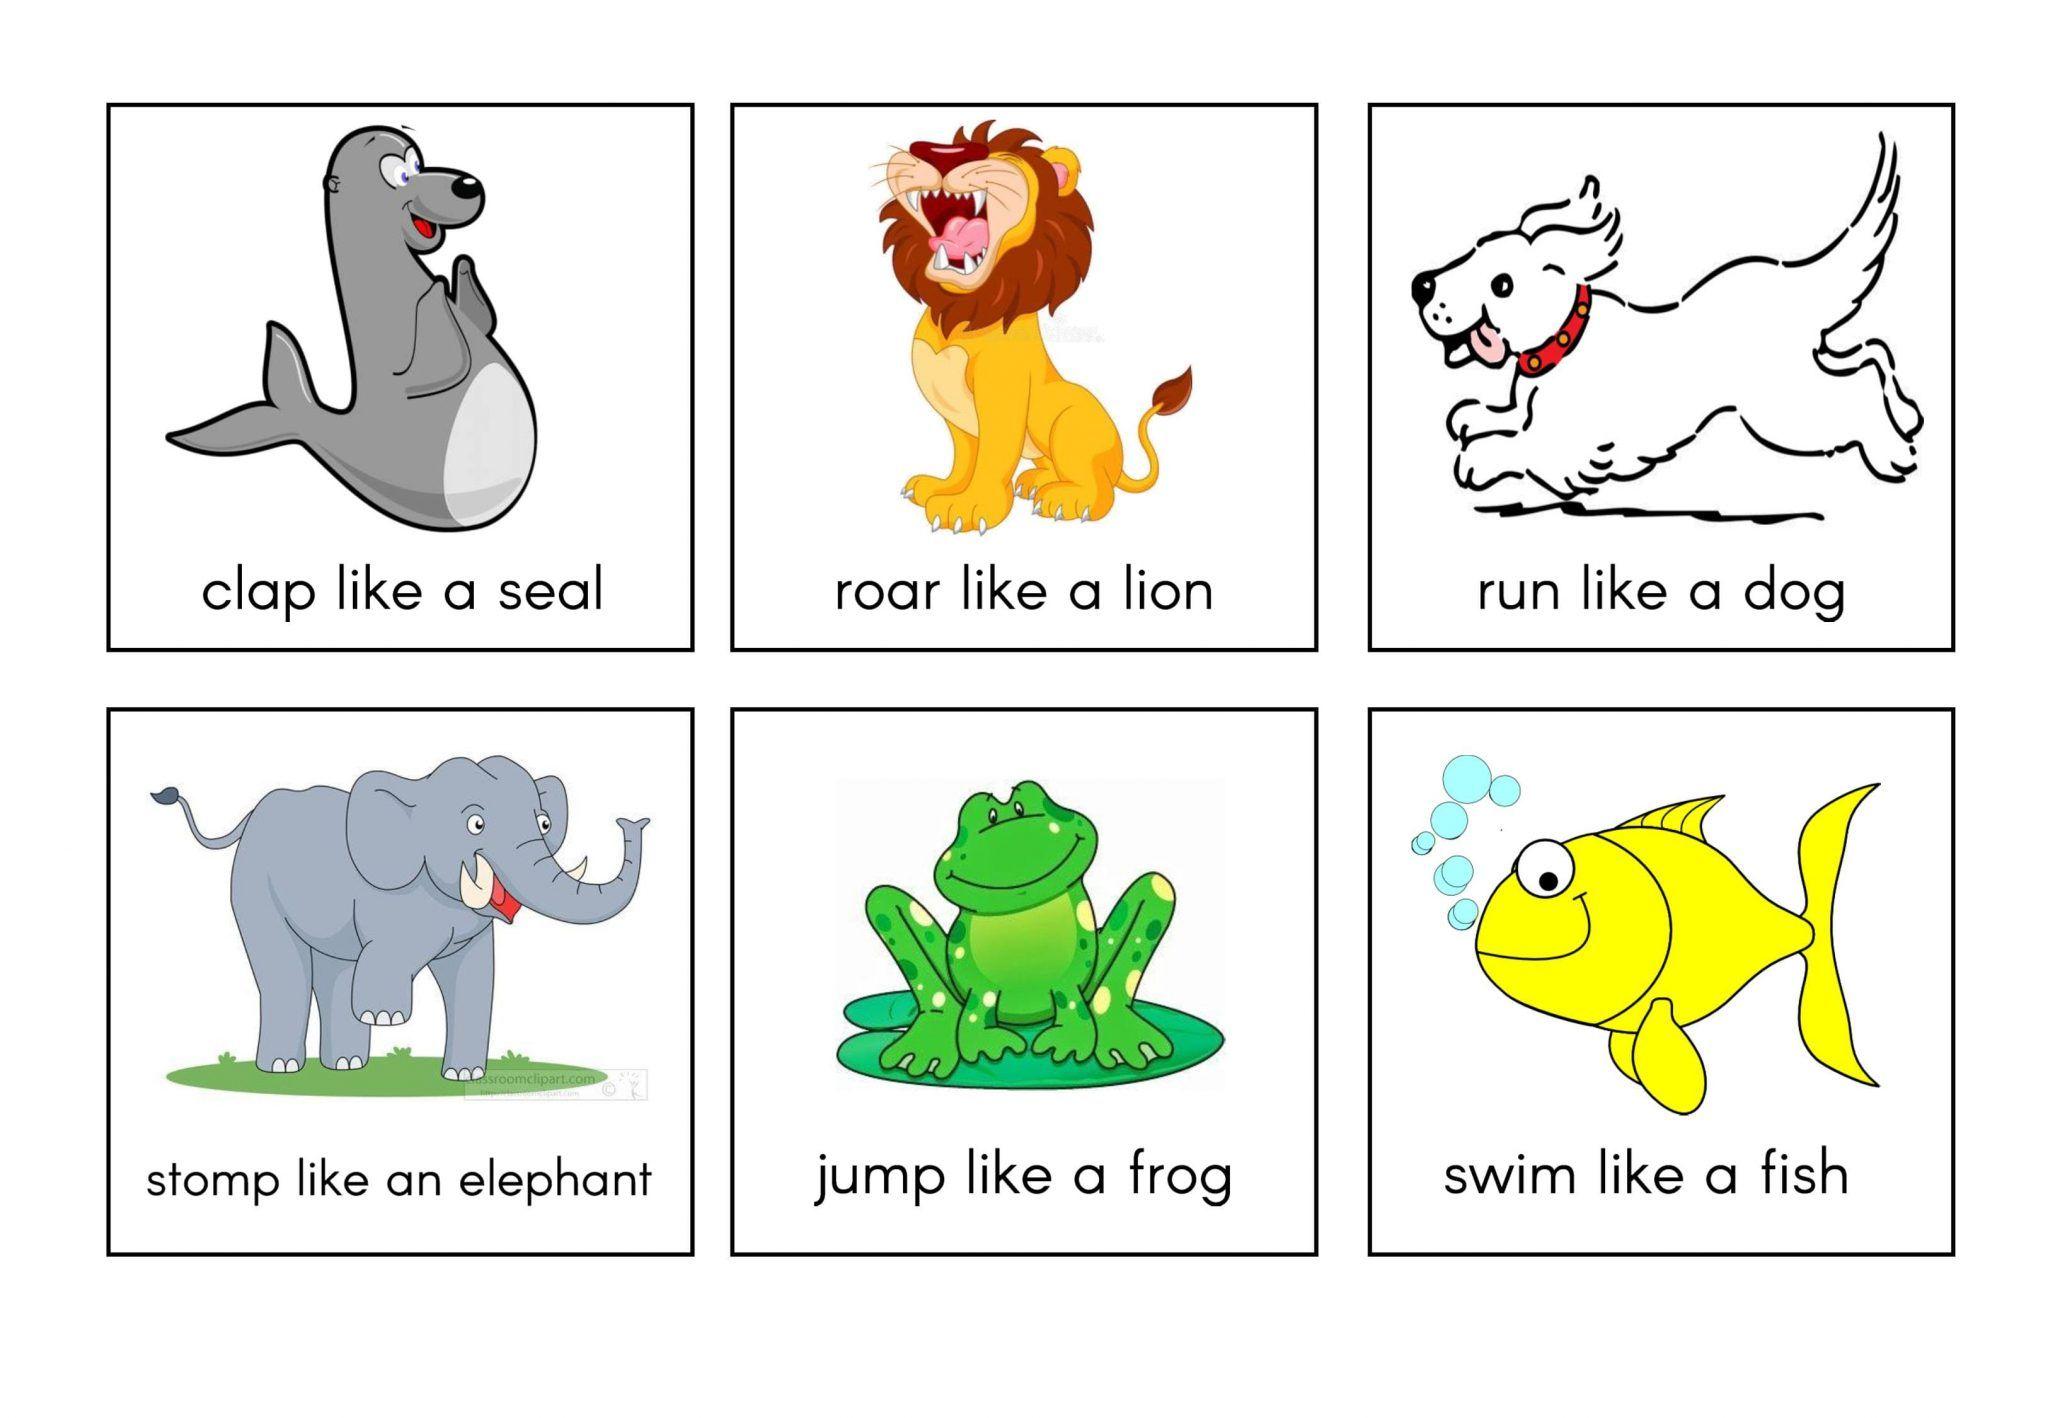 نشاط حركي Act Like An Animal ممتع لرياض الاطفال Comics Peanuts Comics Art